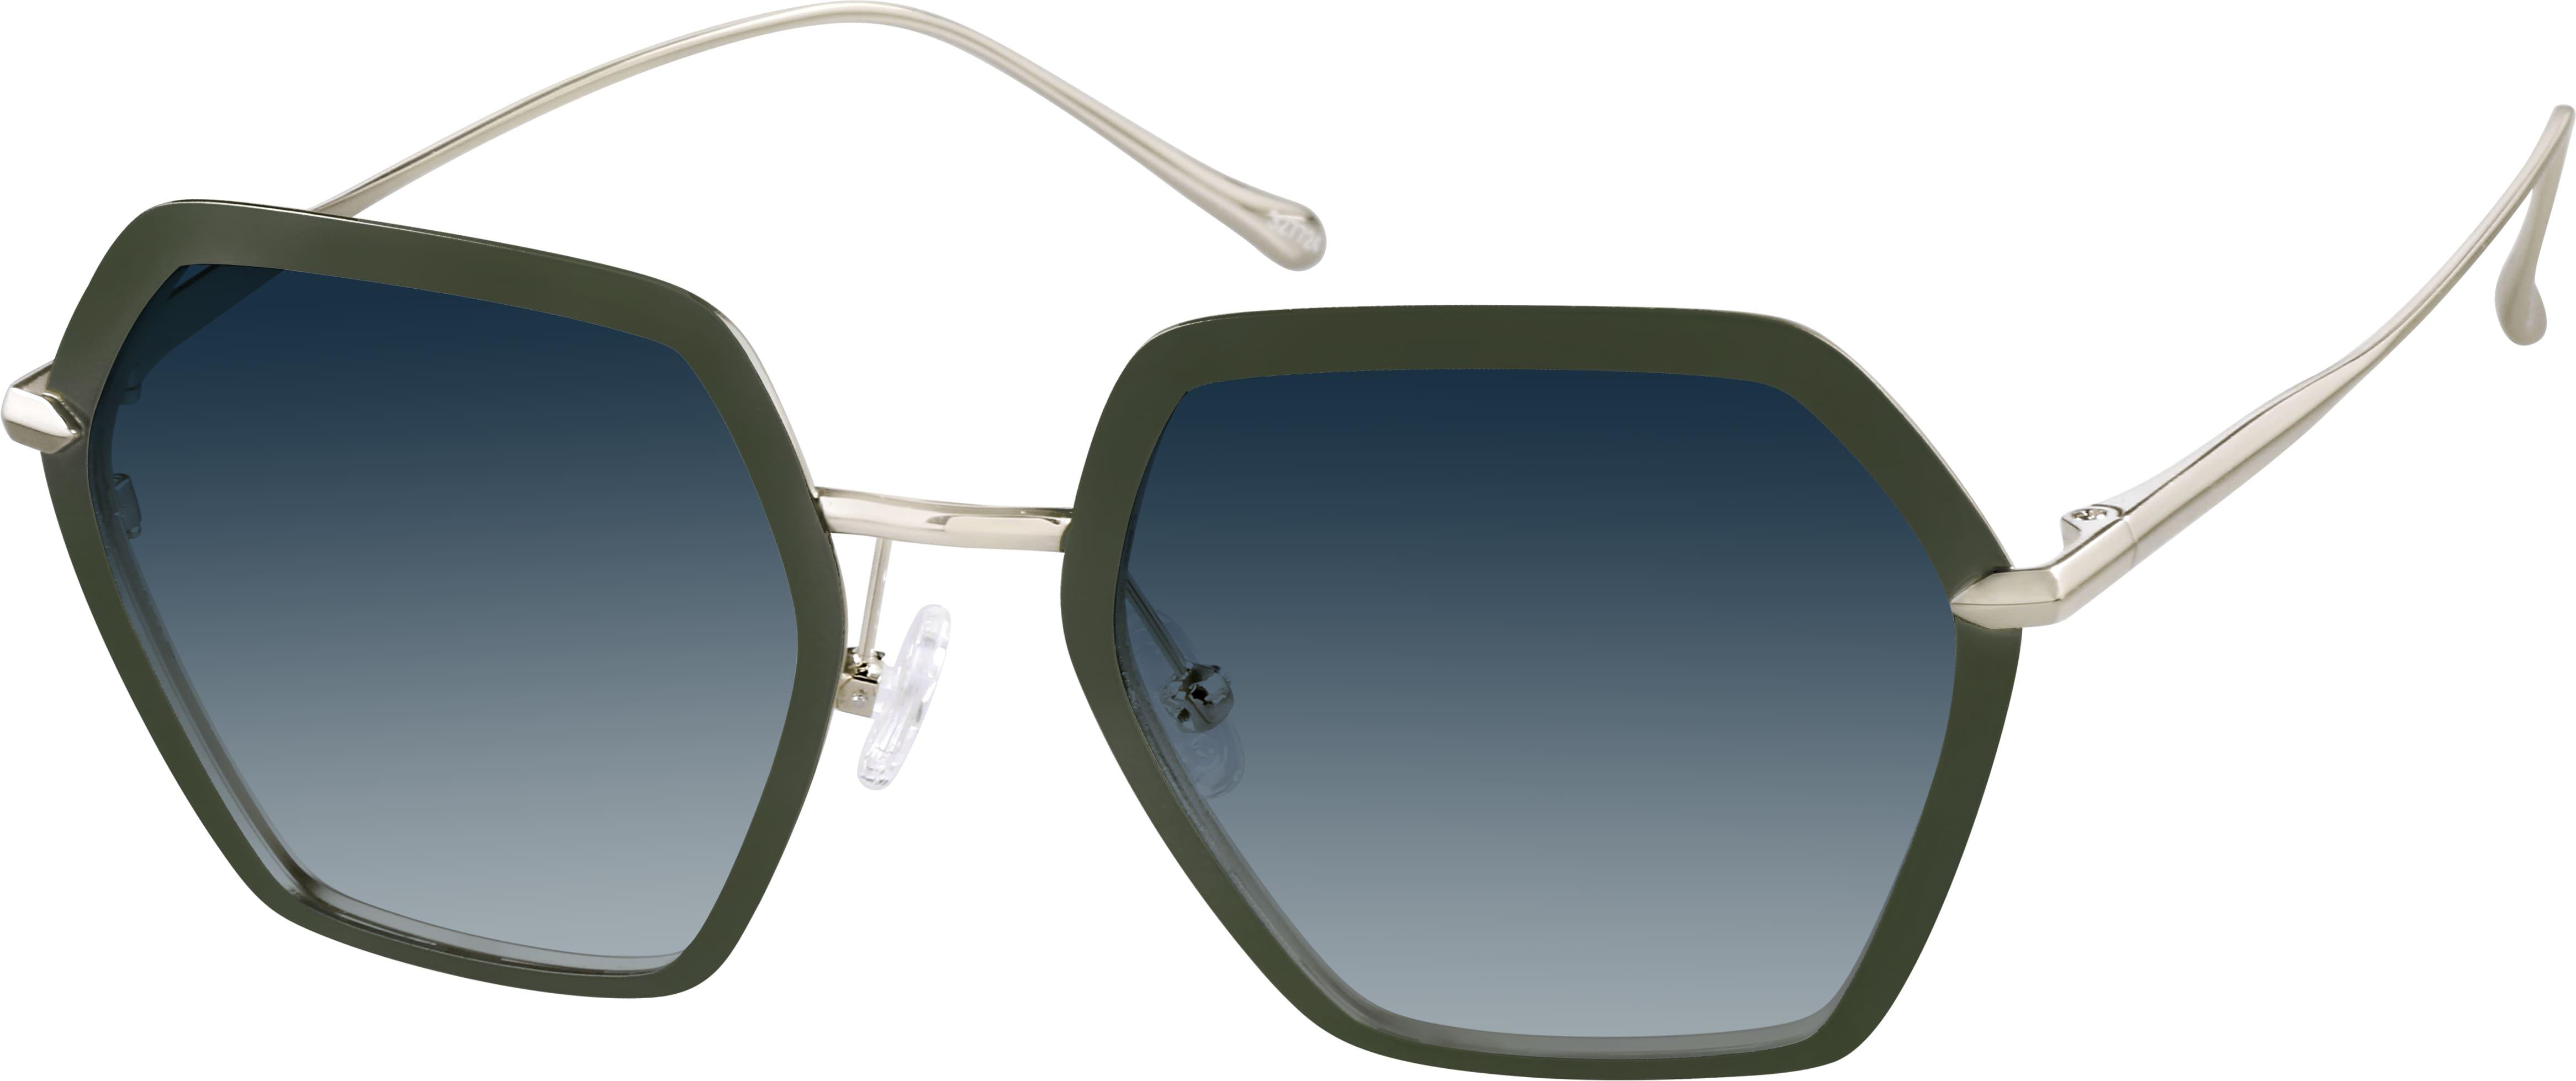 stainless-steel-geometric-angular-glasses-327724